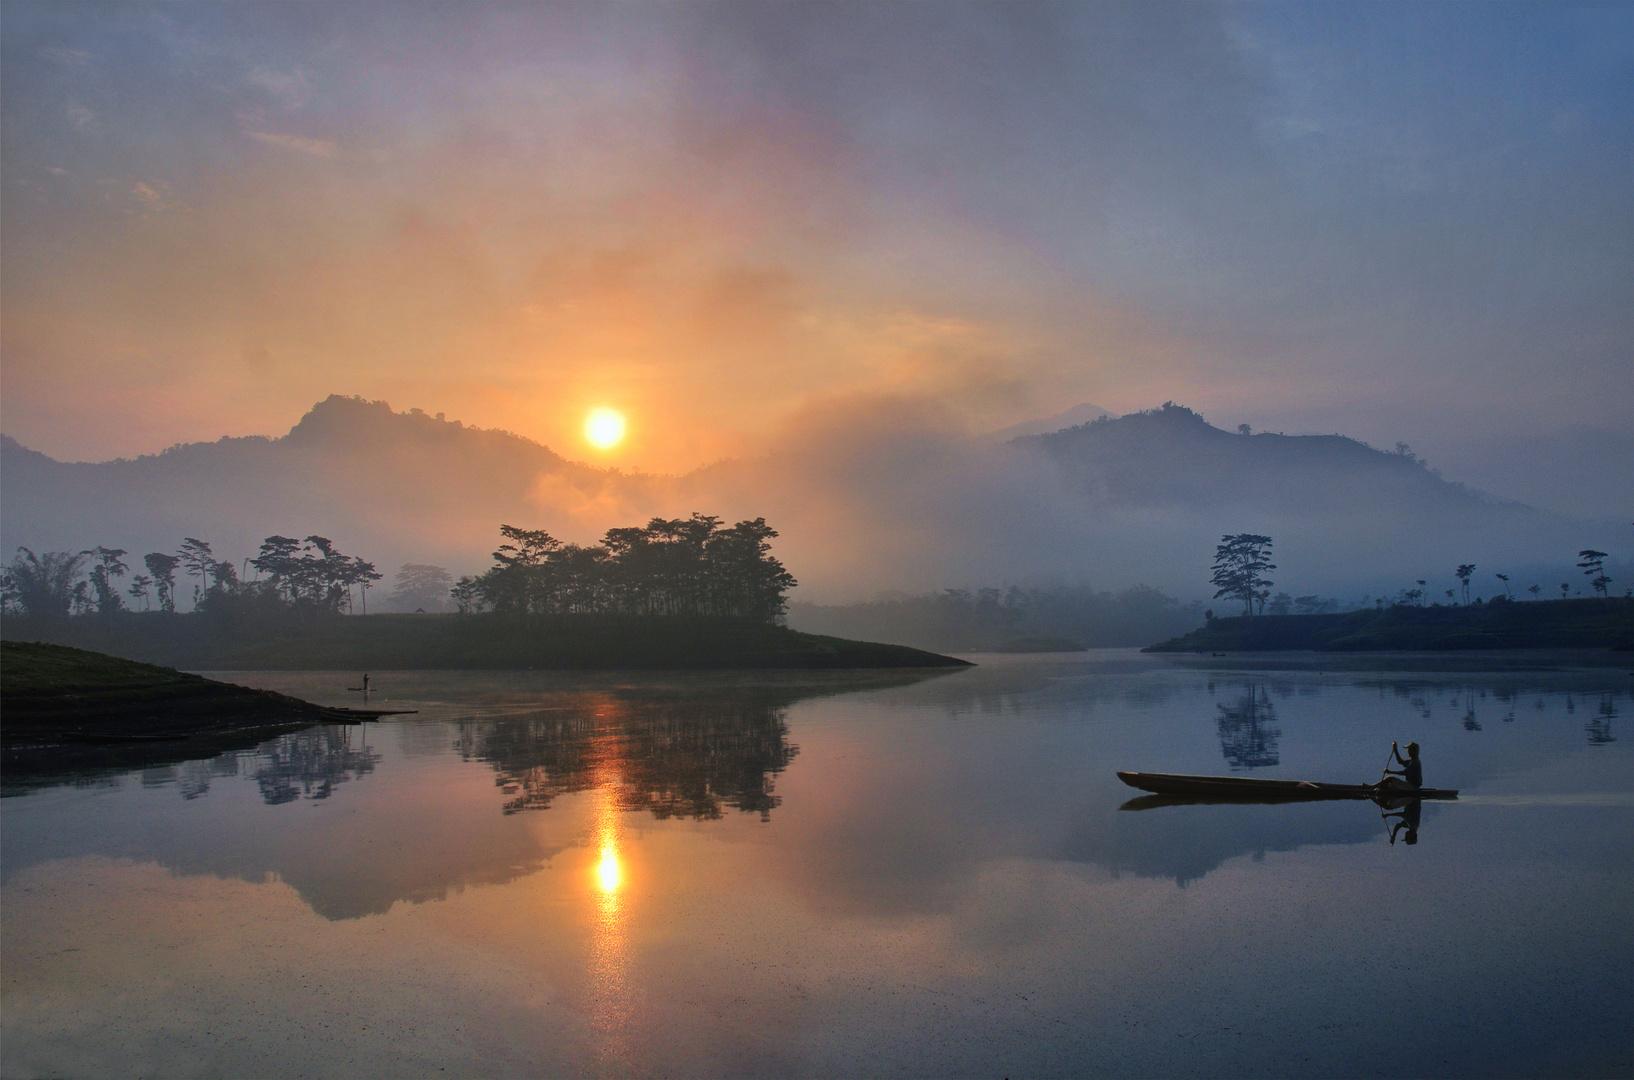 Morninglight at Selorejo